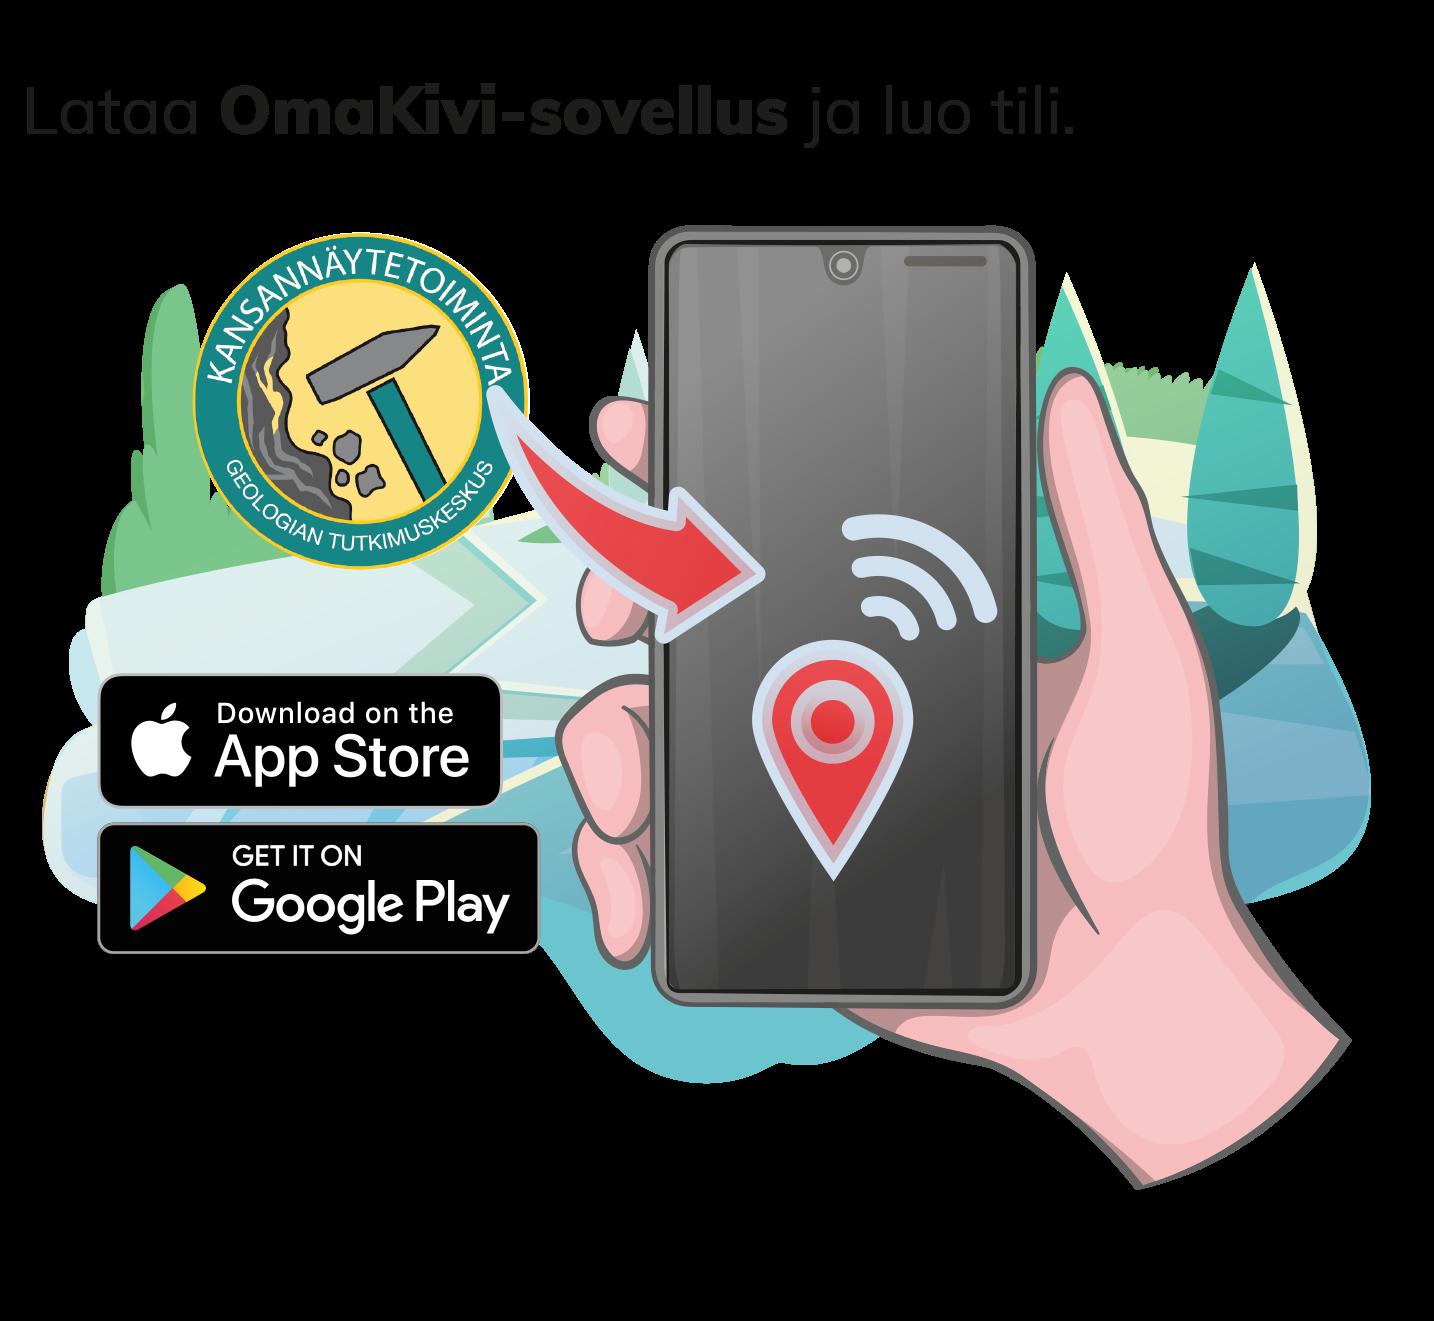 Download the OmaKivi app and register.